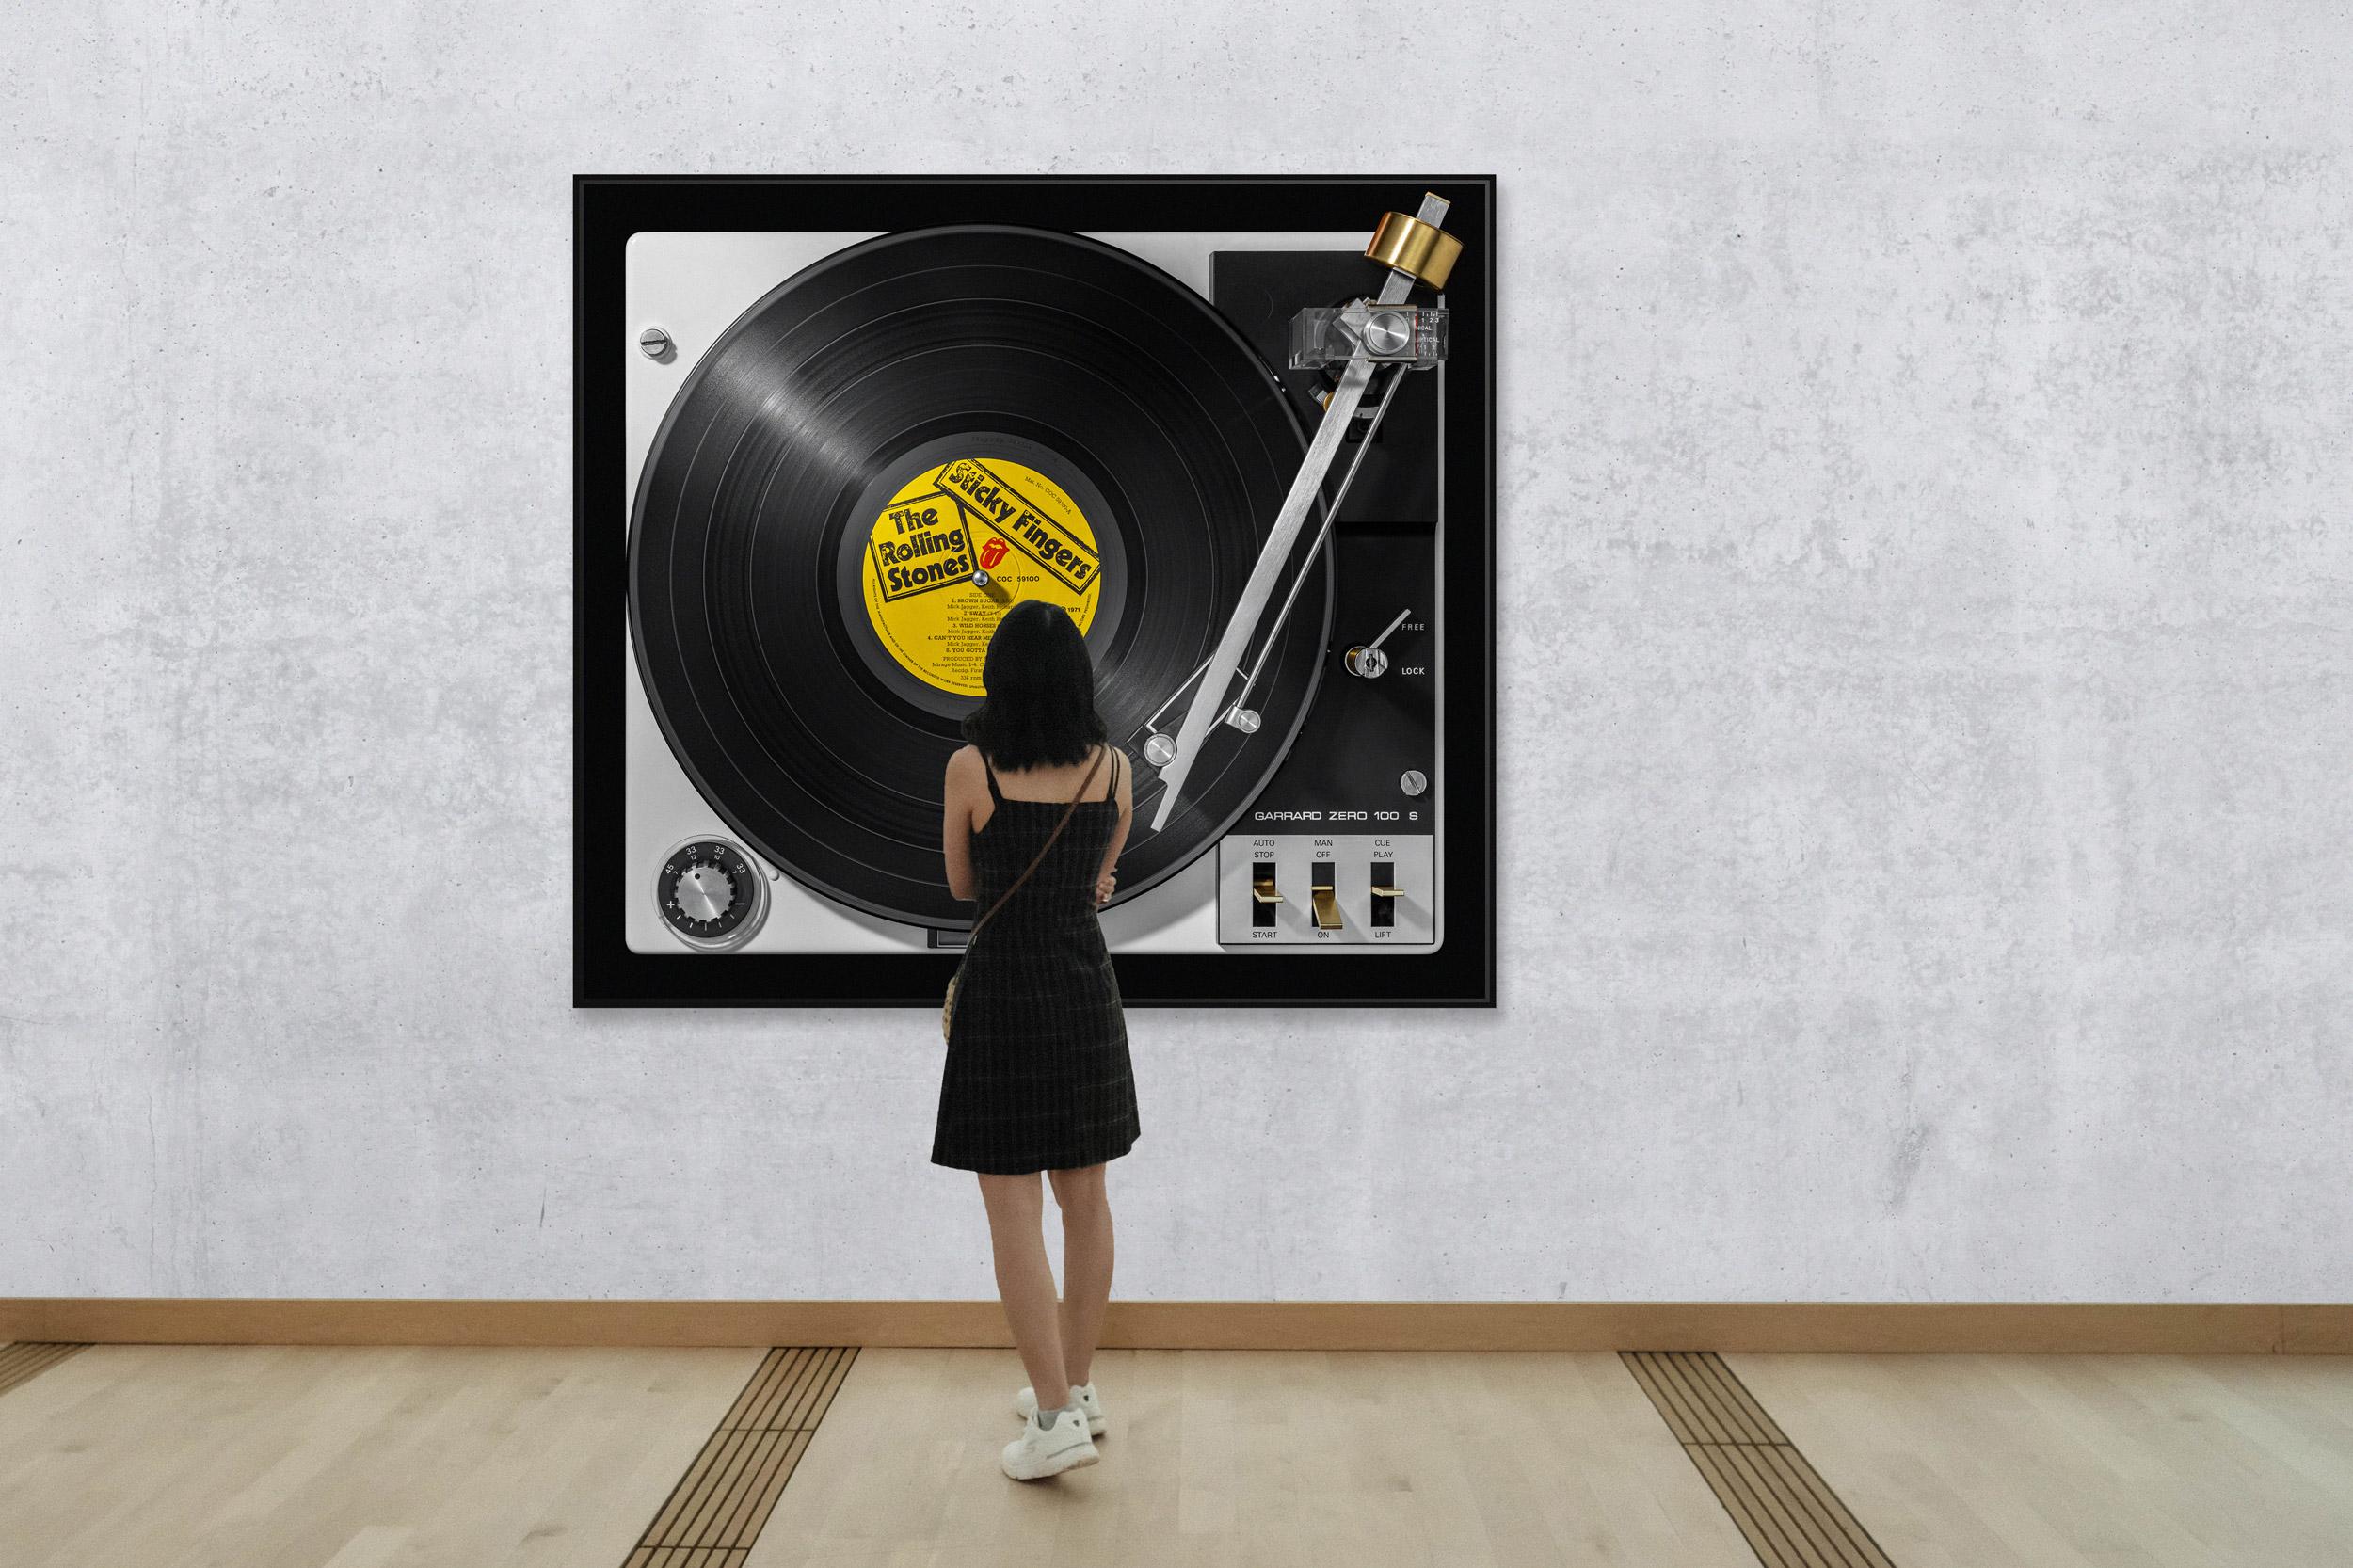 Vinylography No. 27 Rolling Stones Sticky Fingers on Garrard Zero 100 S